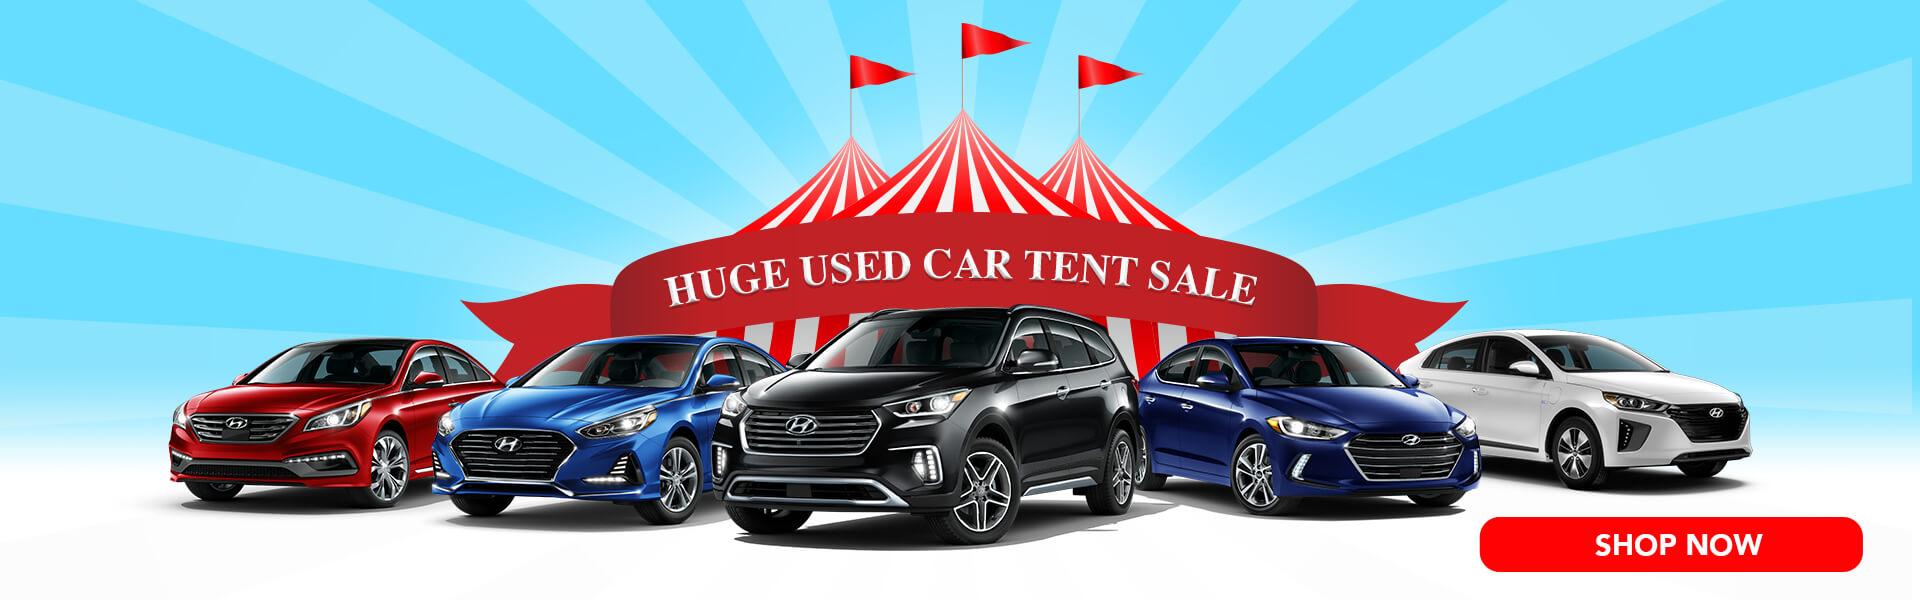 Hyundai Dealership Los Angeles >> New Used Hyundai Dealer Serving Torrance Long Beach Los Angeles